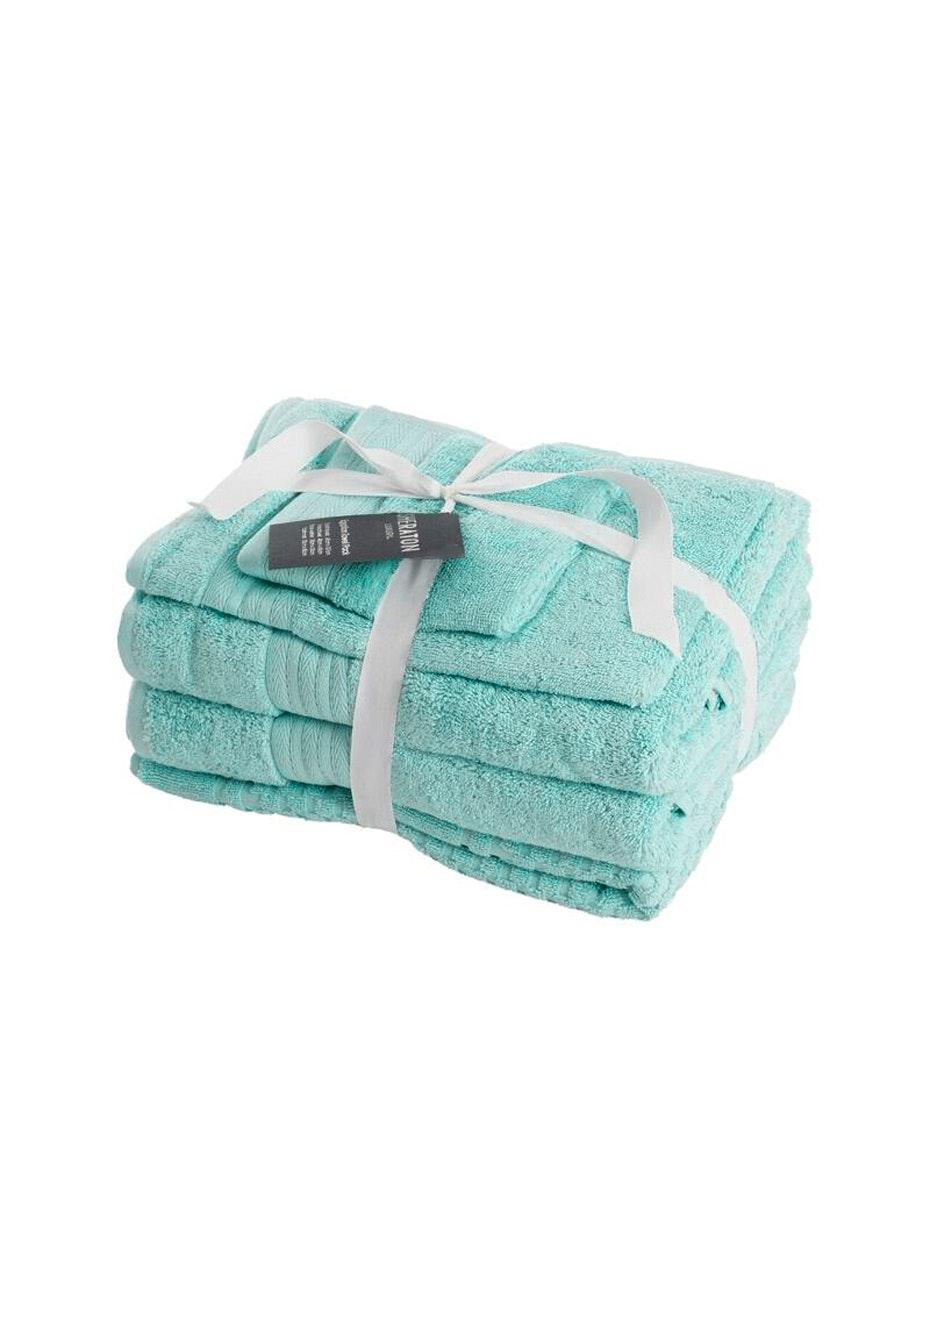 Sheraton Egptian 5 Piece Towel Pack - Colour Seafoam